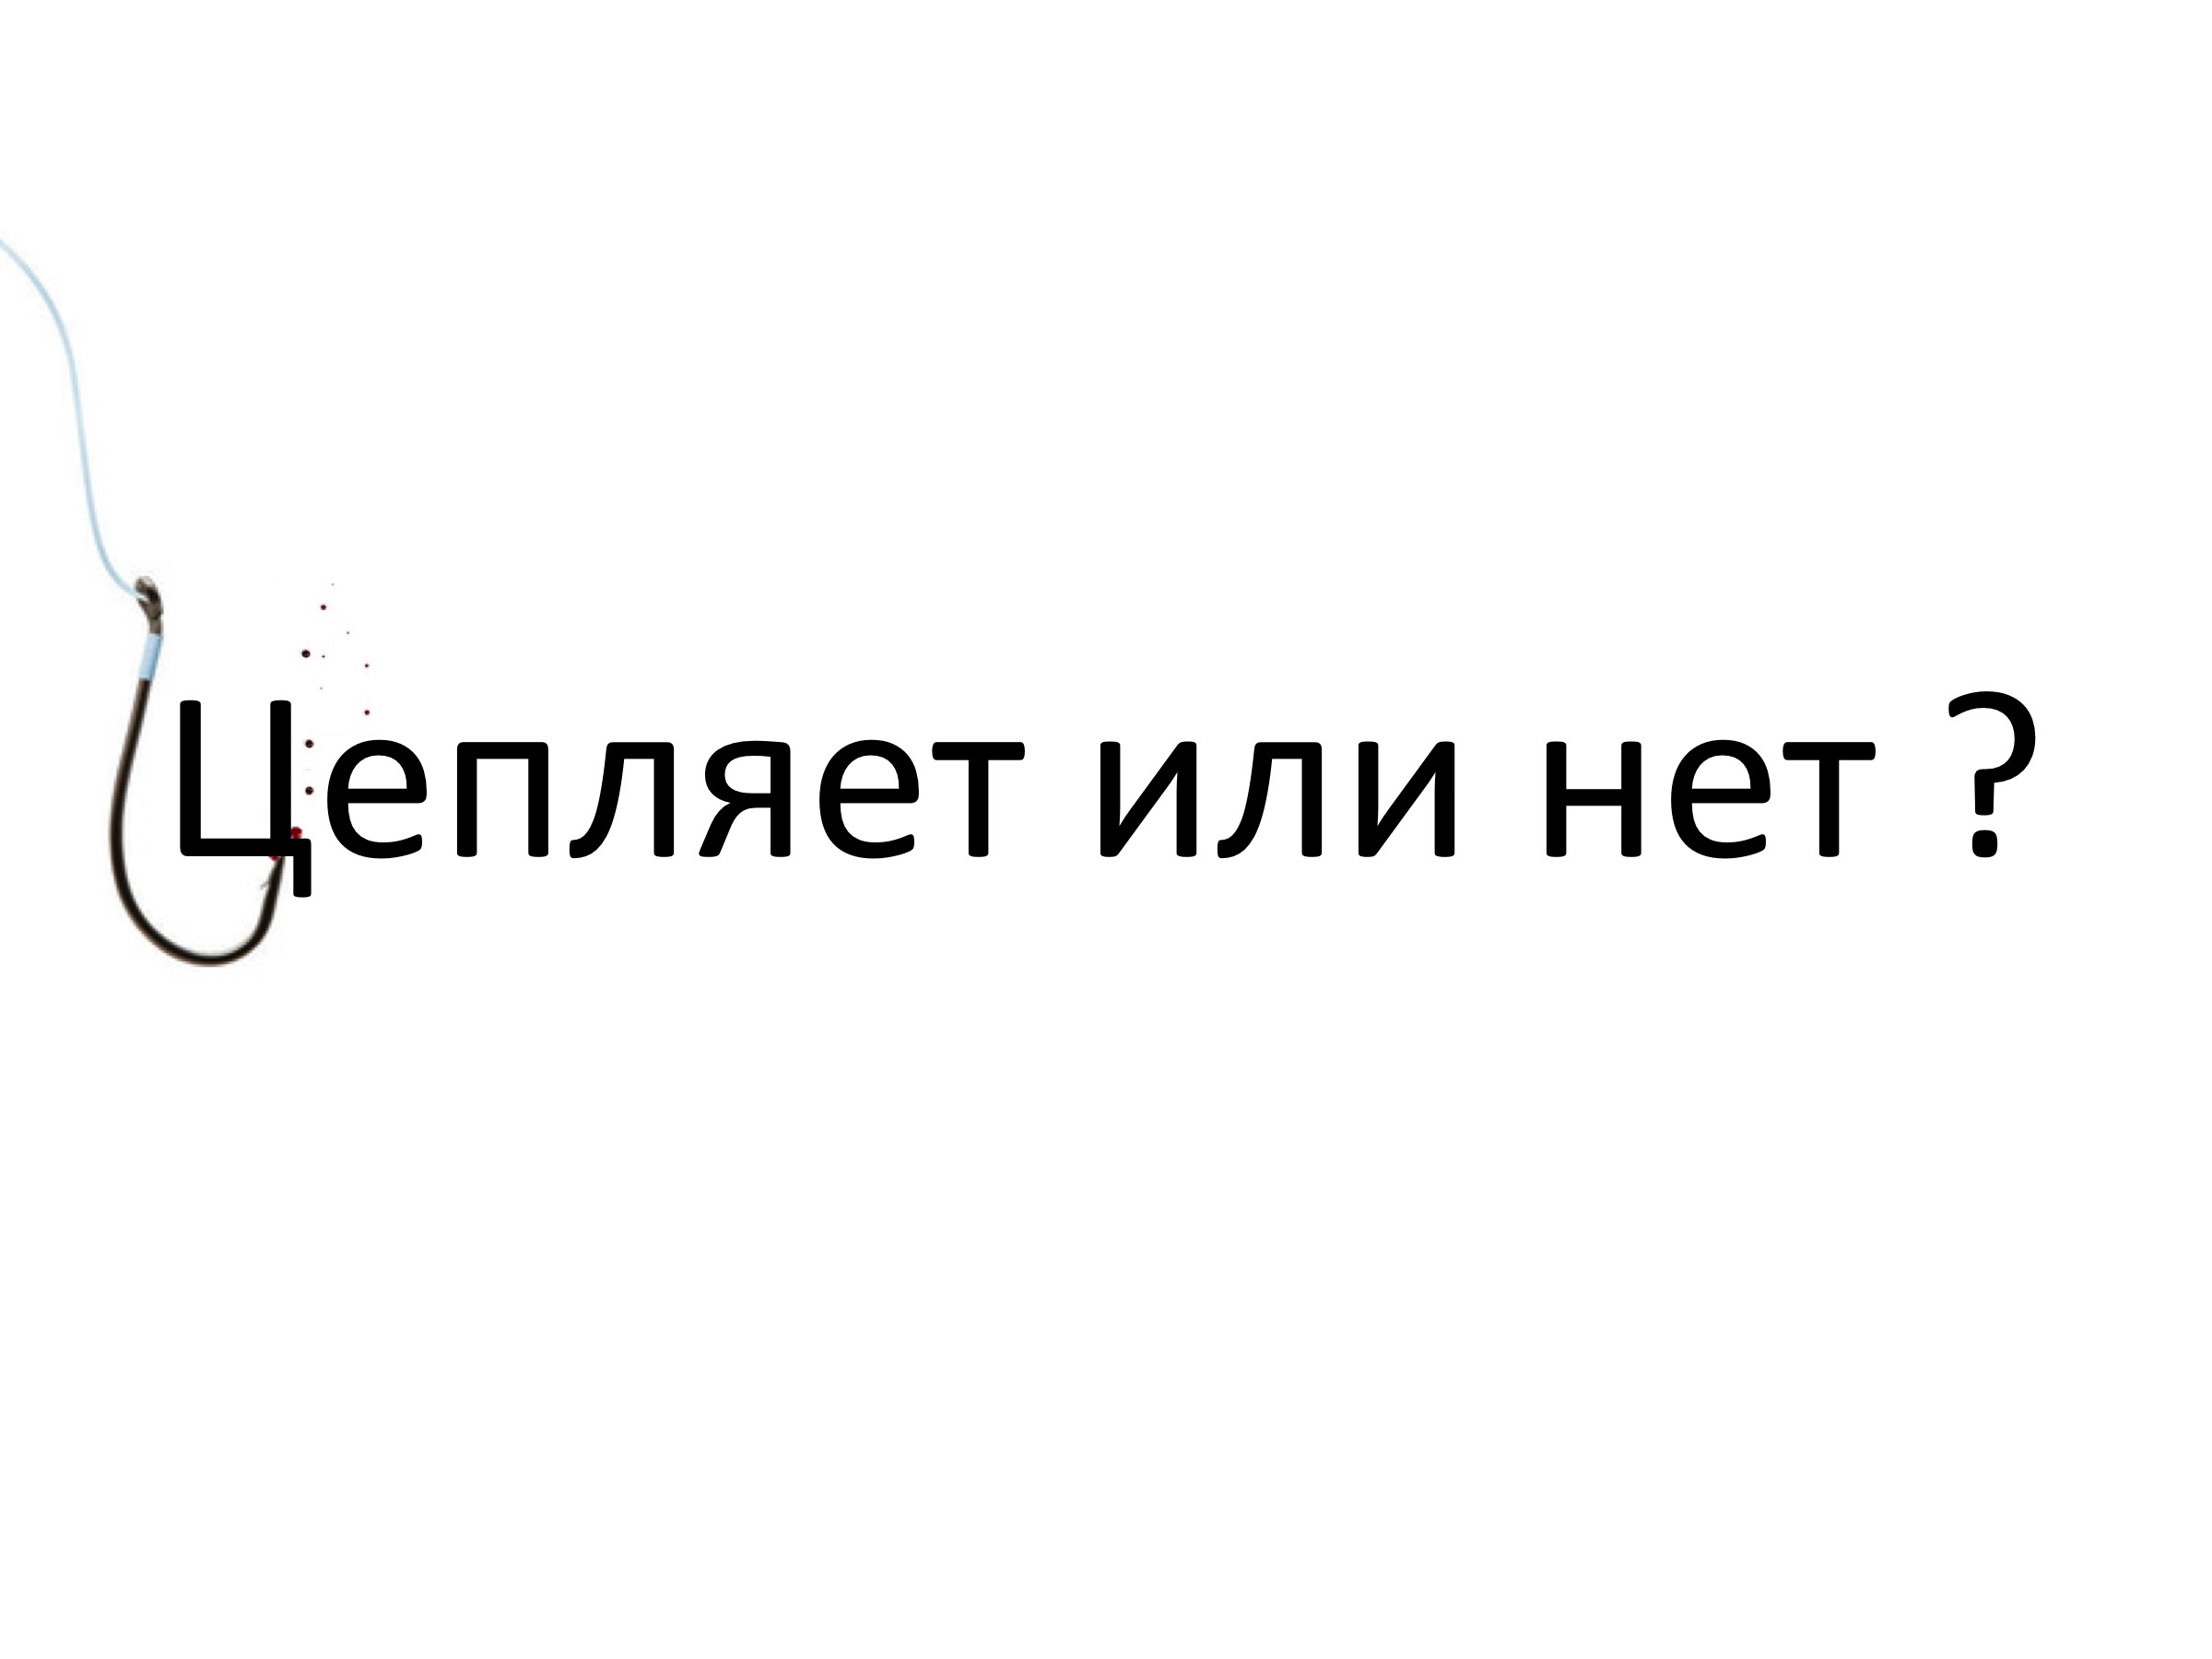 b_54ac26ebf404e.jpg